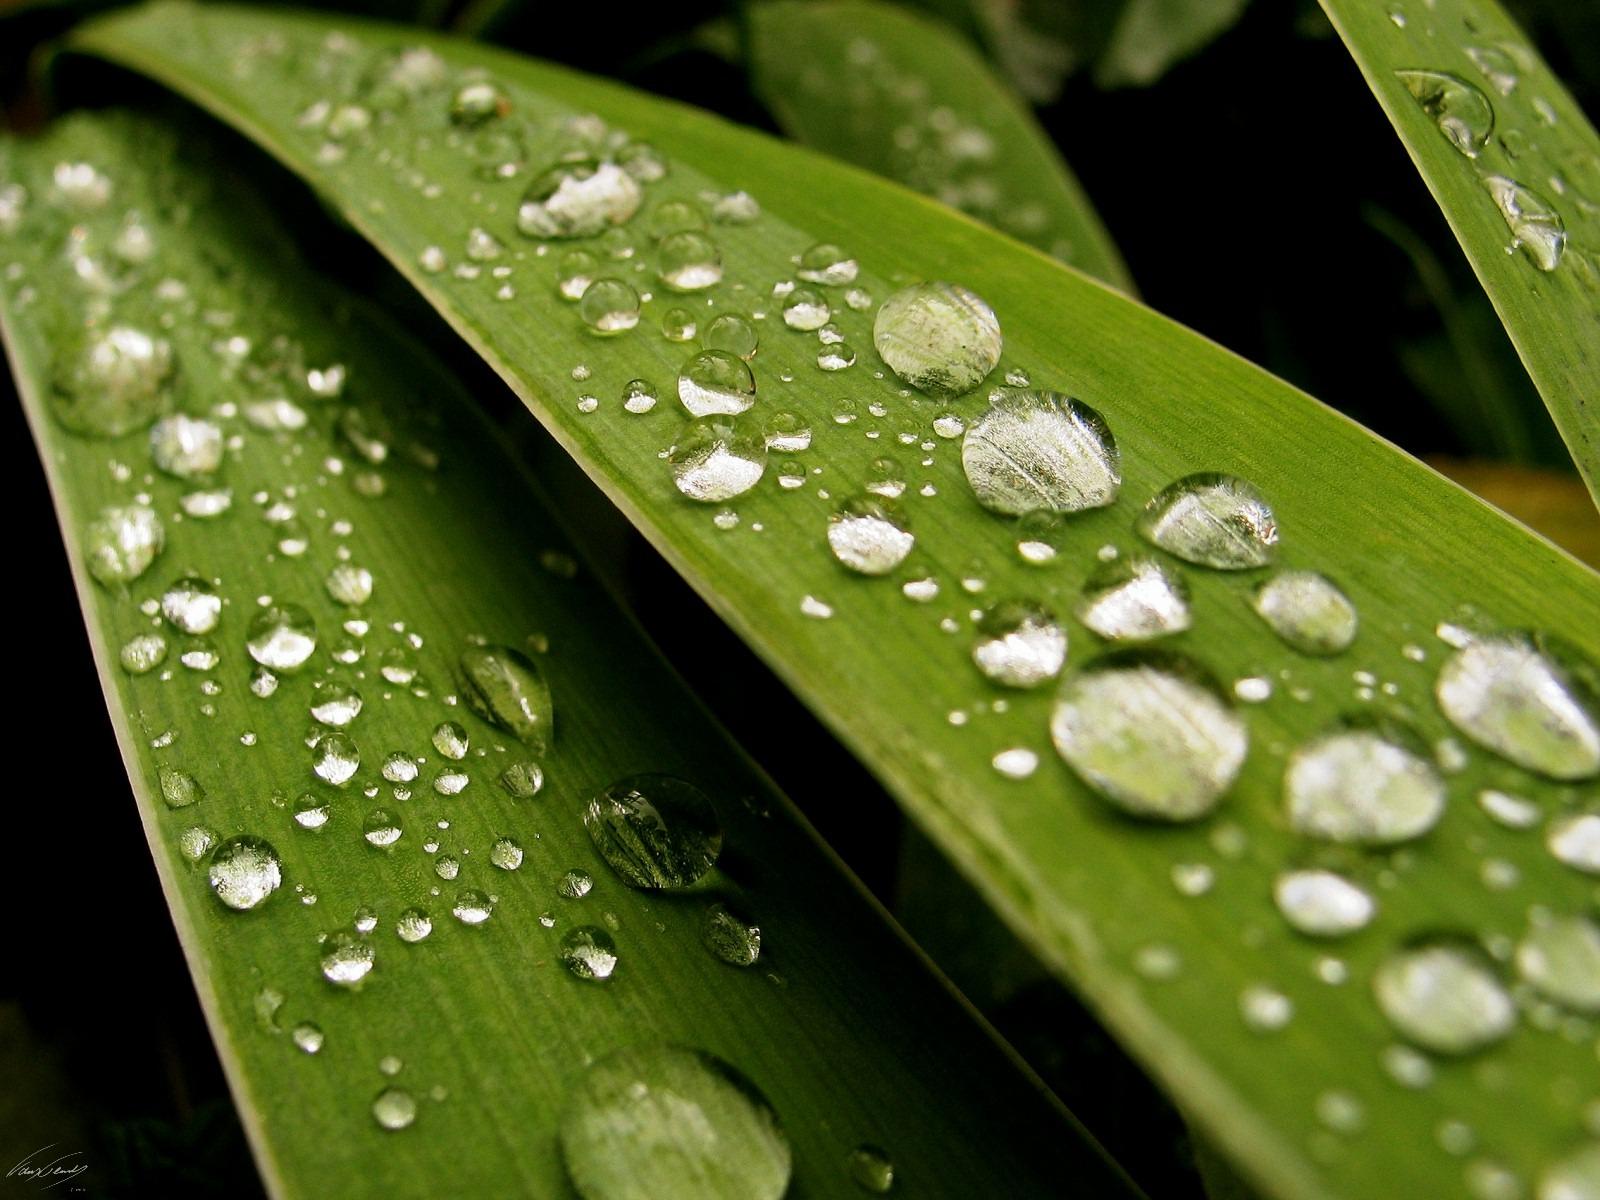 http://2.bp.blogspot.com/_pOW9LvKap60/TO0kvb38K-I/AAAAAAAAADw/5Or2TgpKHVU/s1600/rain_drops.jpg